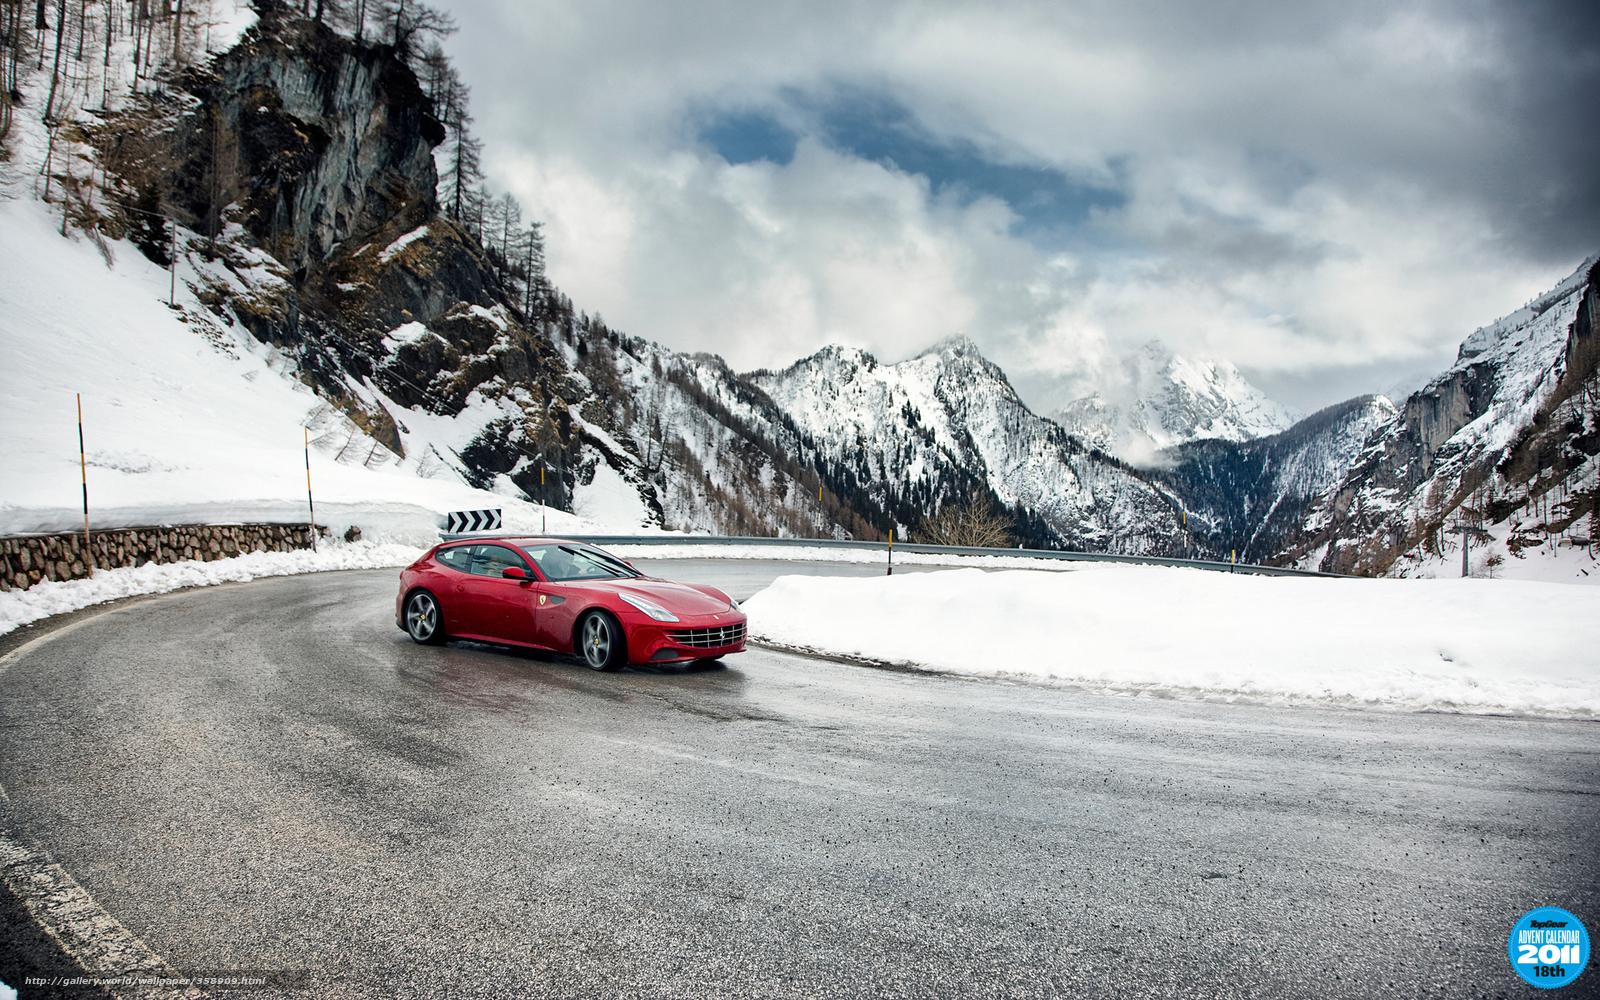 Download Wallpaper Top Gear Top Gear Ferrari Ff Free Desktop Wallpaper In The Resolution 1920x1200 Picture 358909